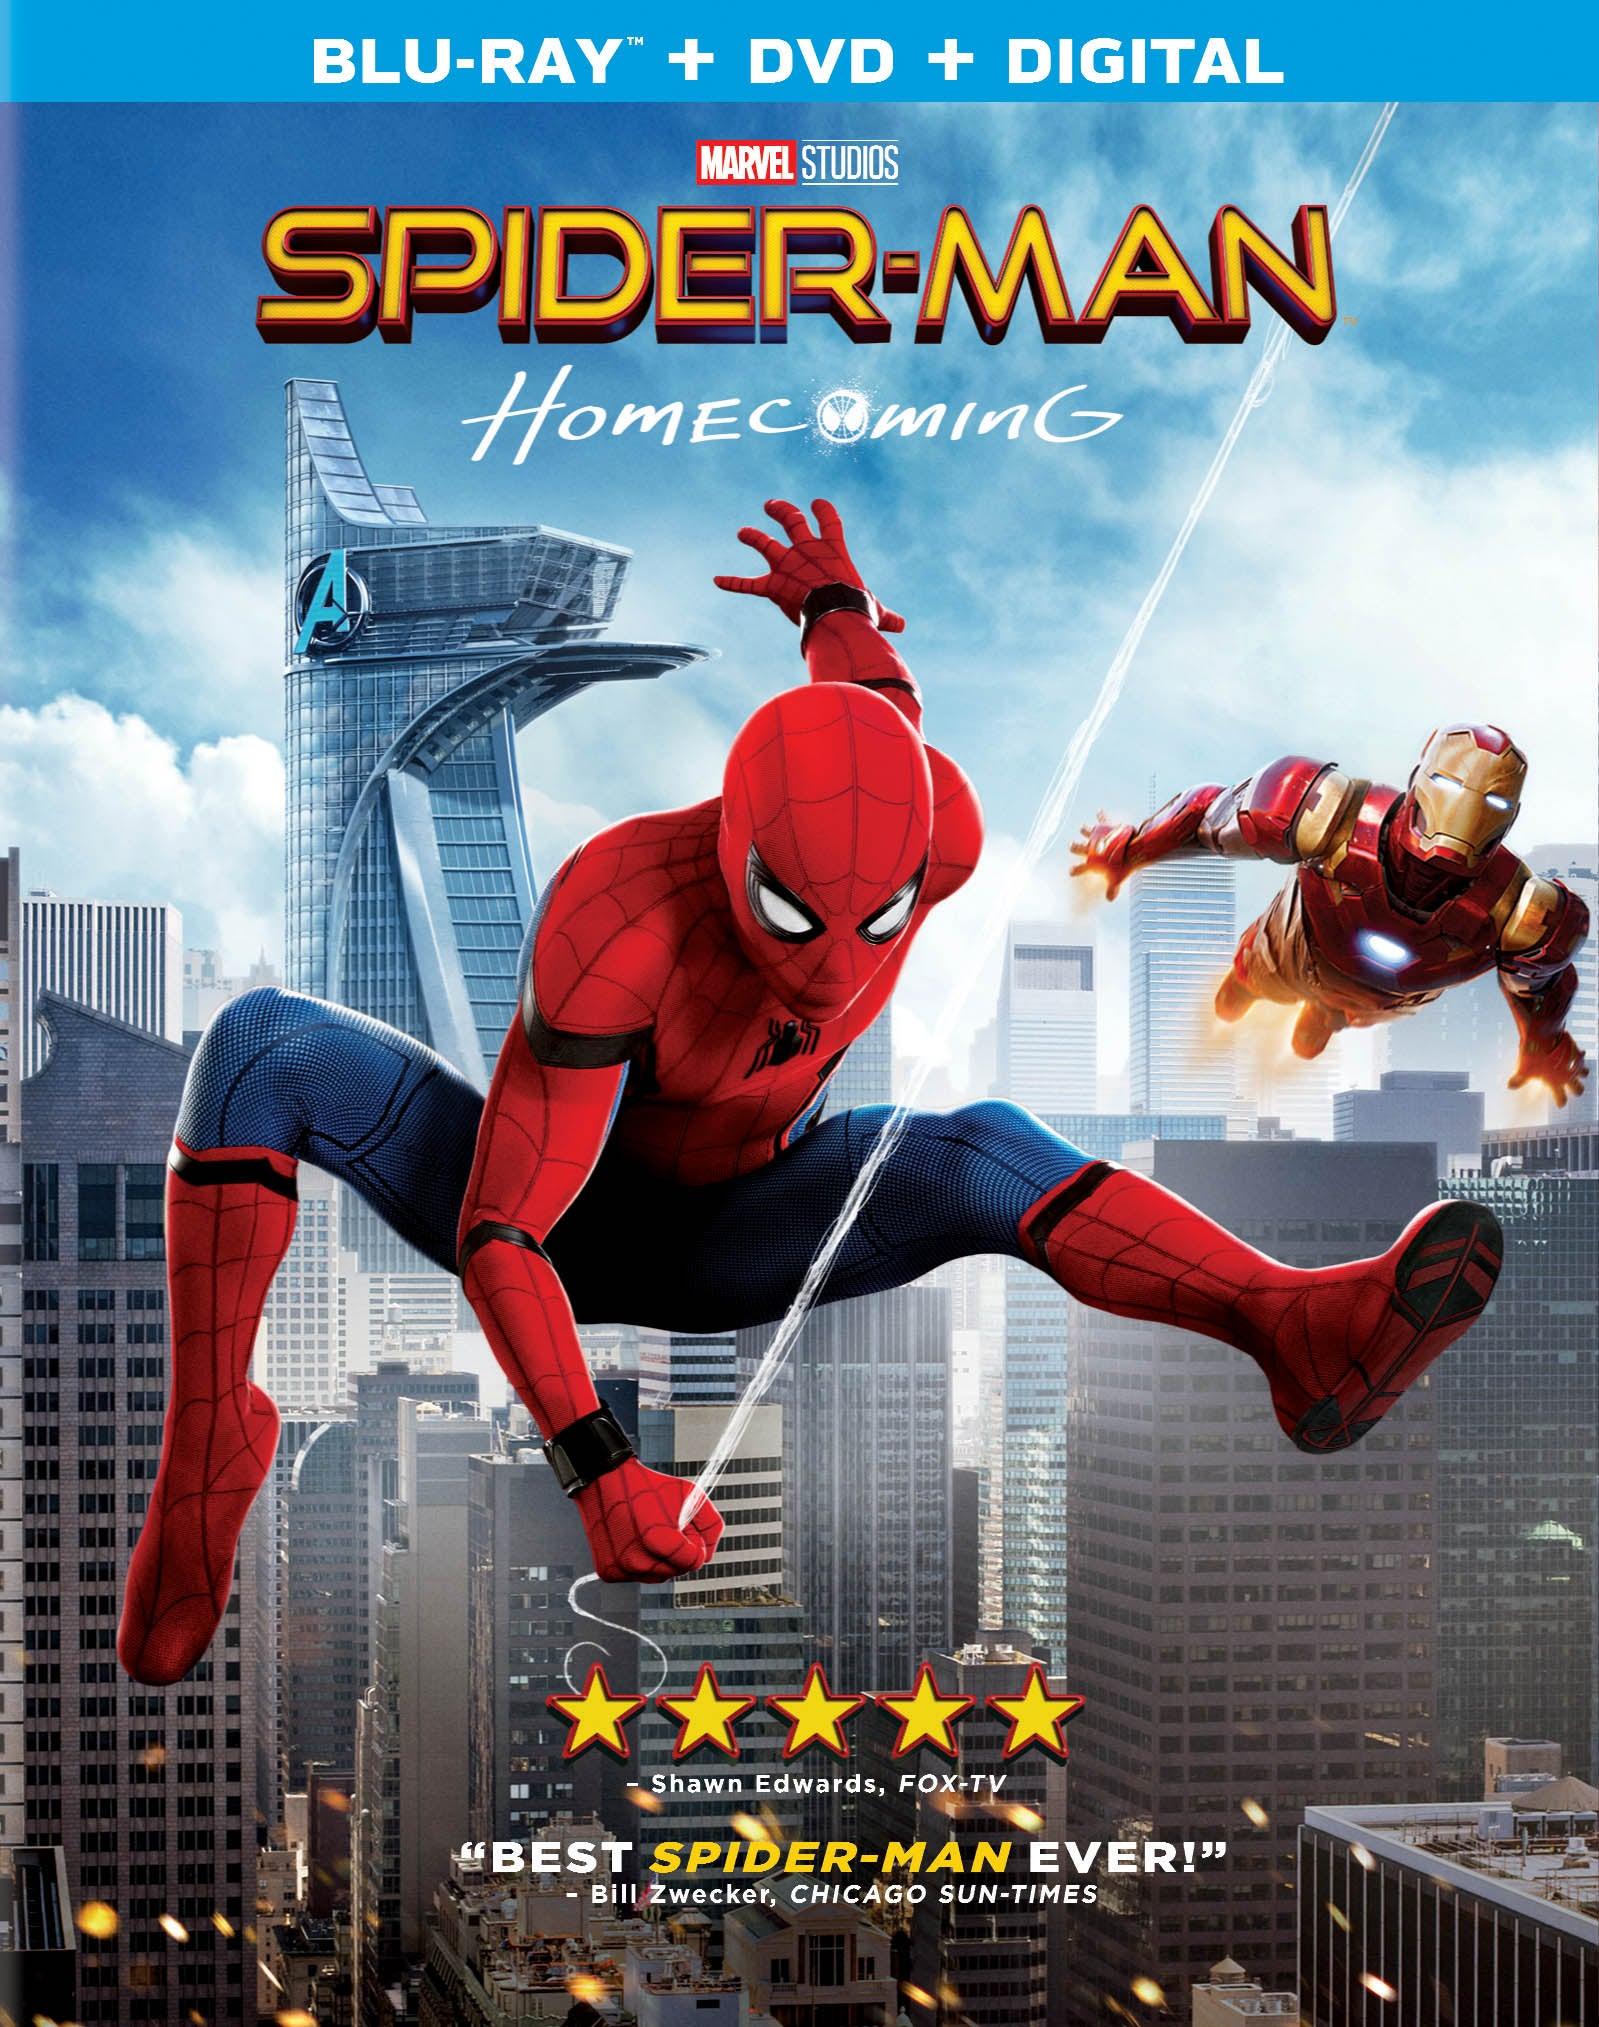 Spider-Man Homecoming Blu-ray Art